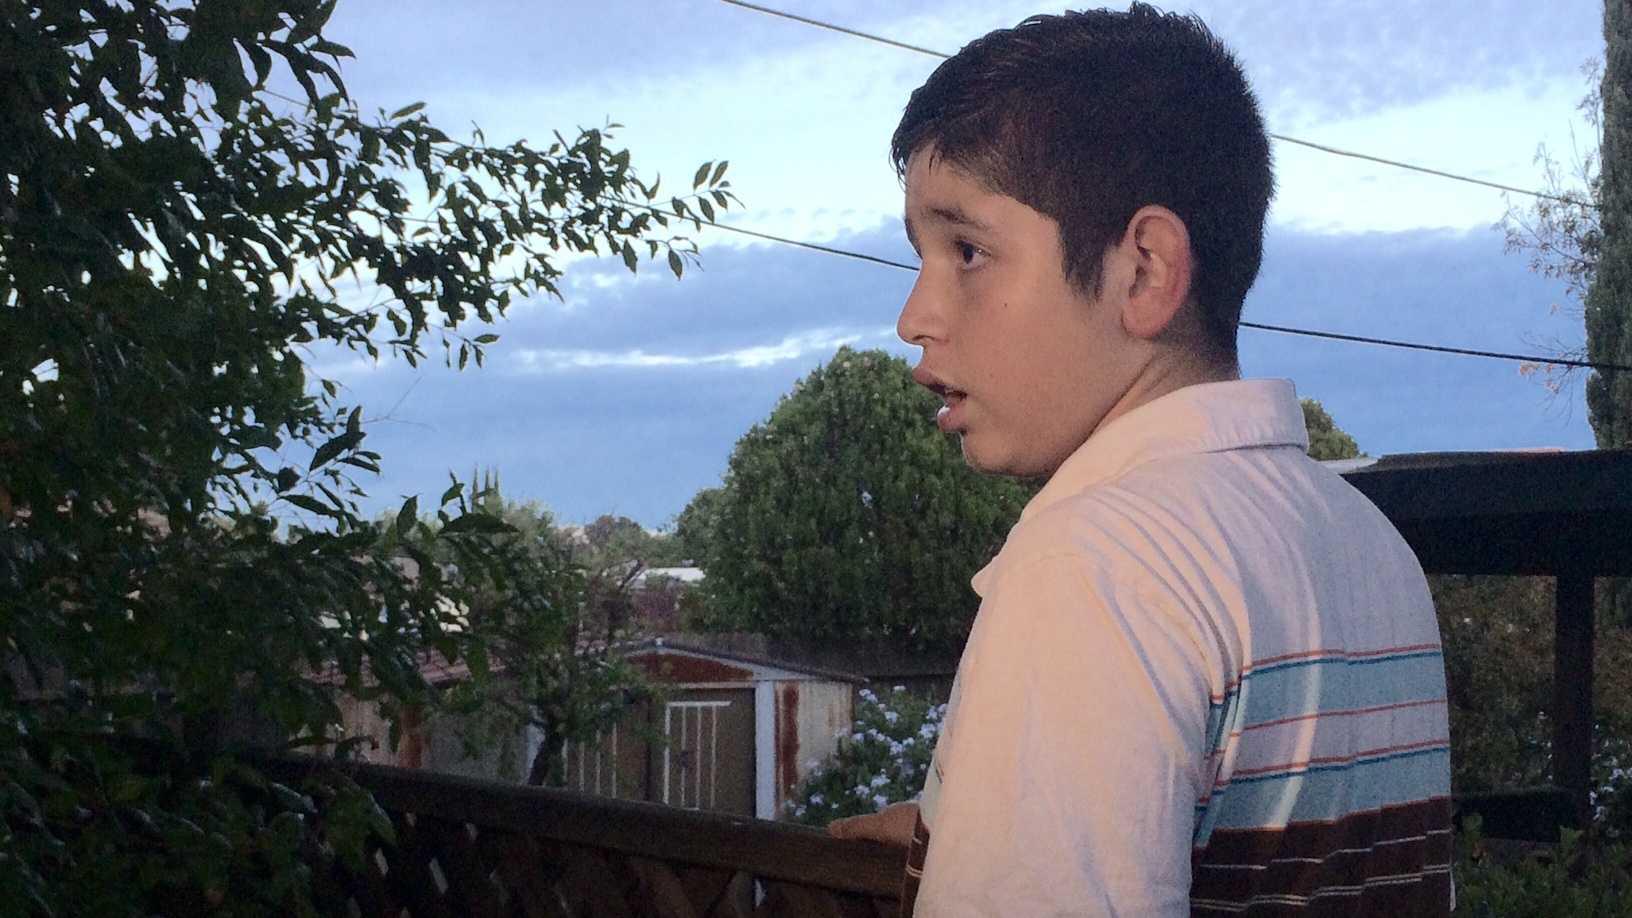 Jonathan Garcia (Oct. 22, 2014)